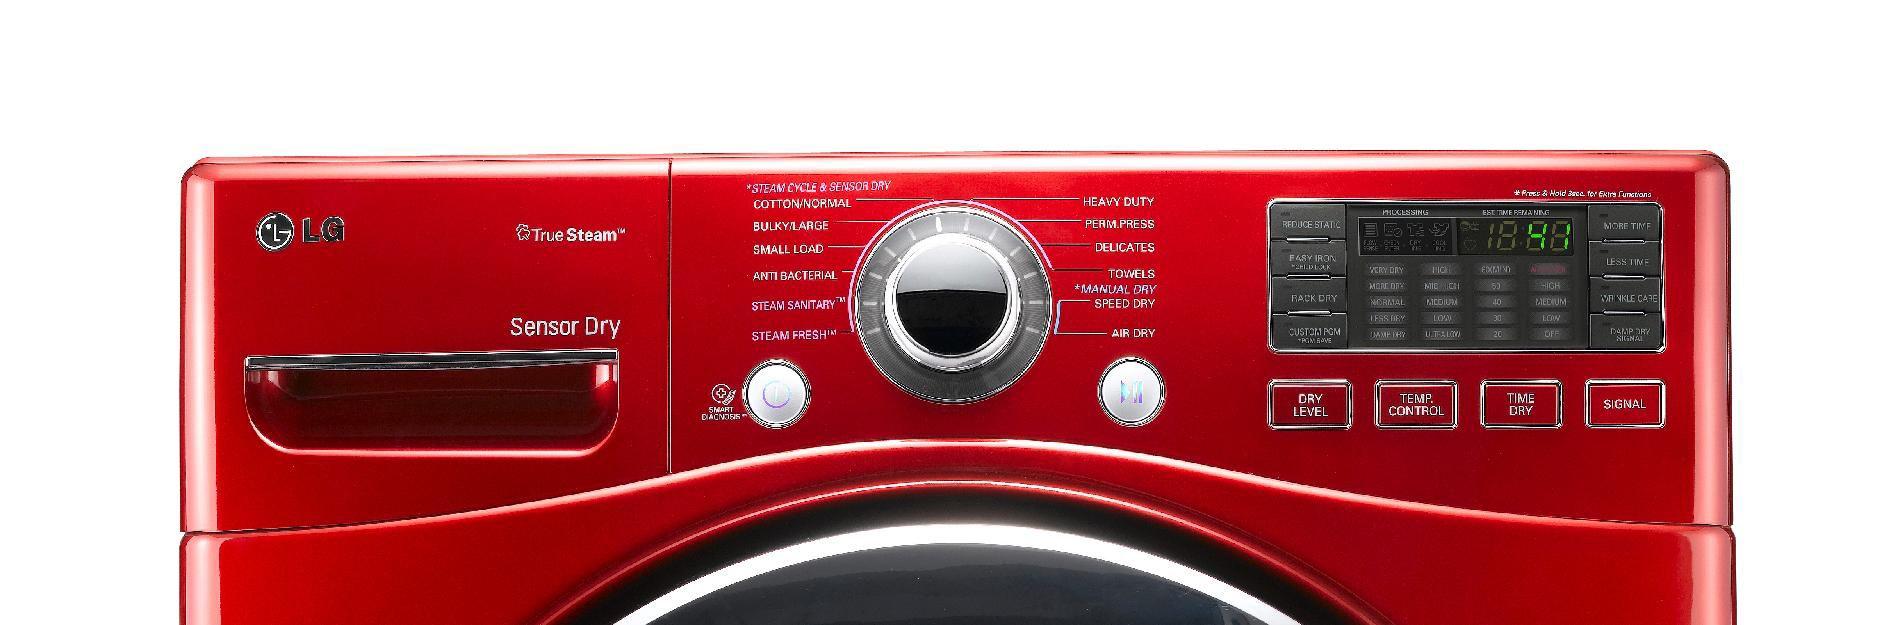 LG 7.3 cu. ft. Steam Electric Dryer w/ Sensor Dry - Red